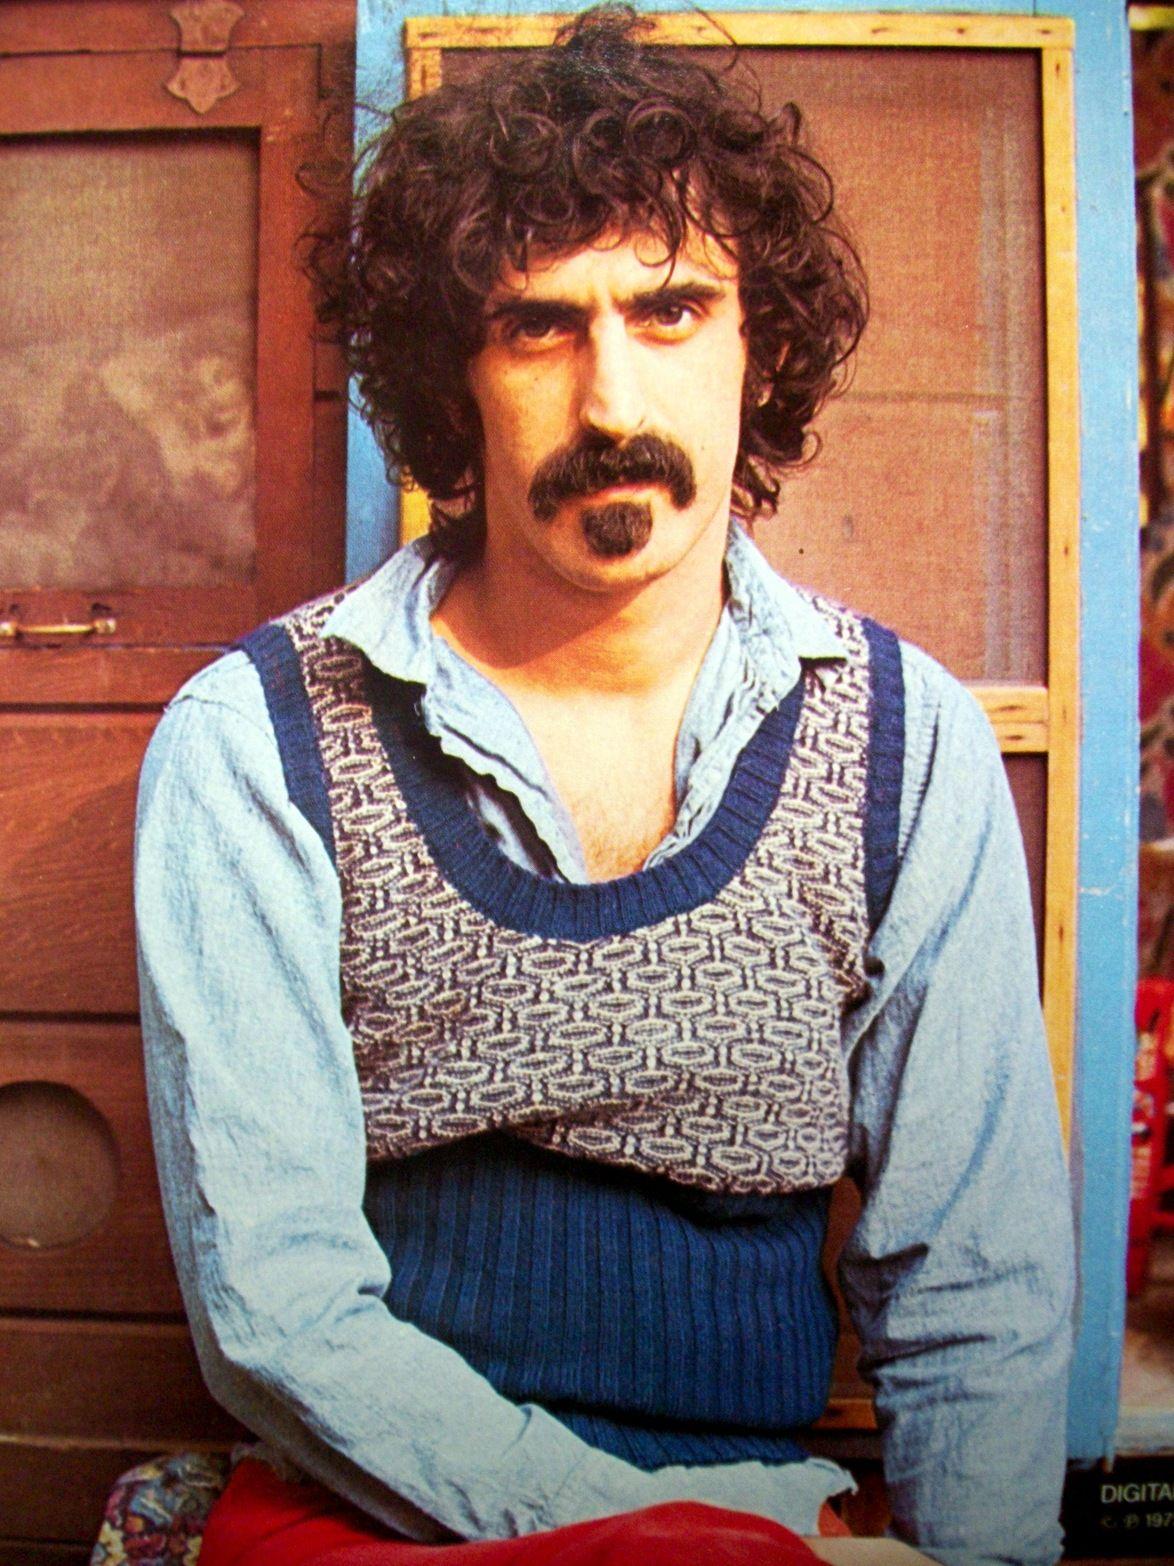 Frank Zappa Happy Birthday regarding a mind is like a parachute, it doesn't work if it's not open